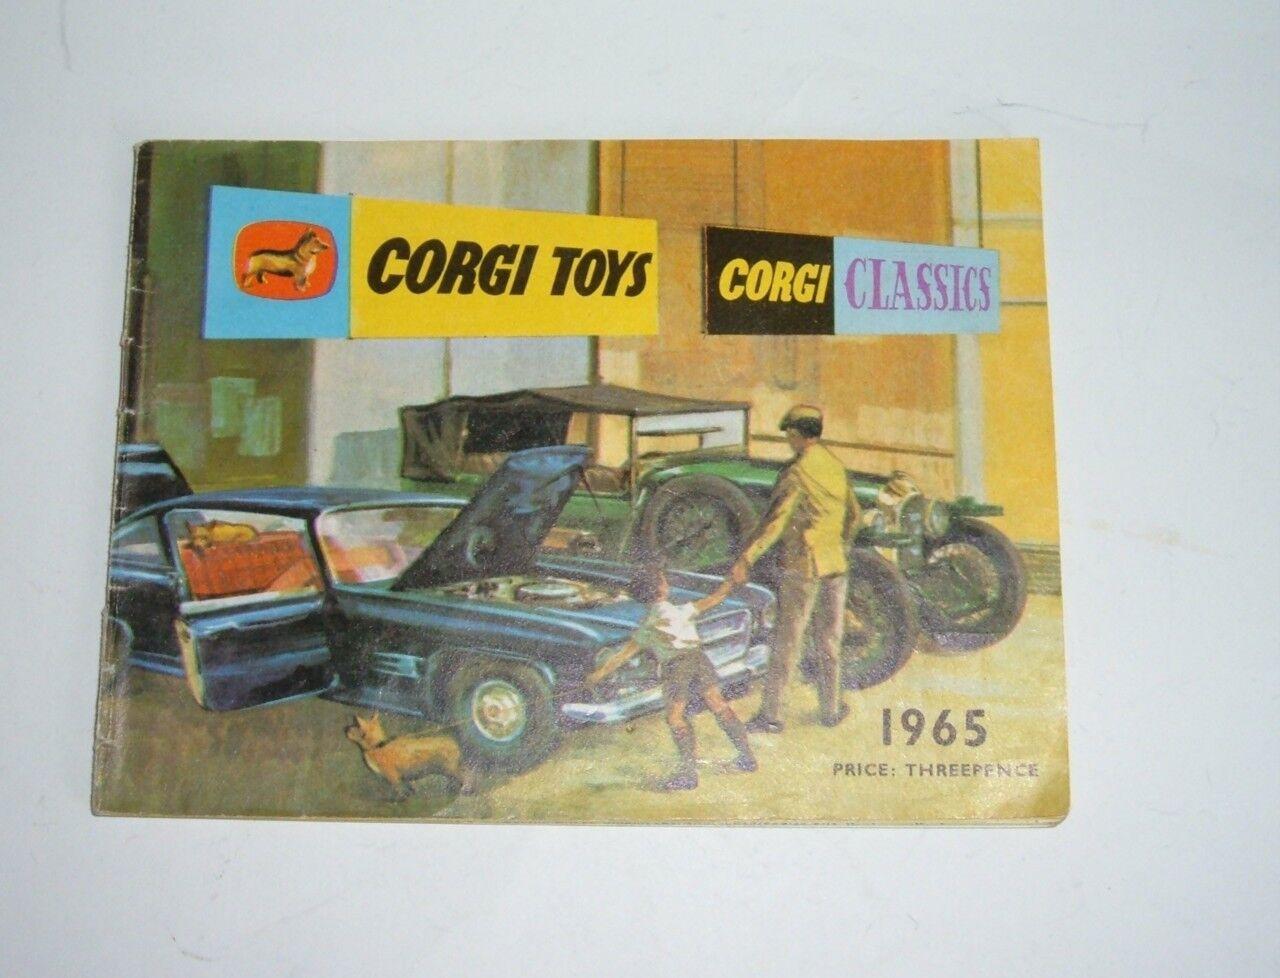 Corgi Corgi Corgi Toys 1966, fechada 1965, precio  tres peniques, - Excelente Perfecto 19929c